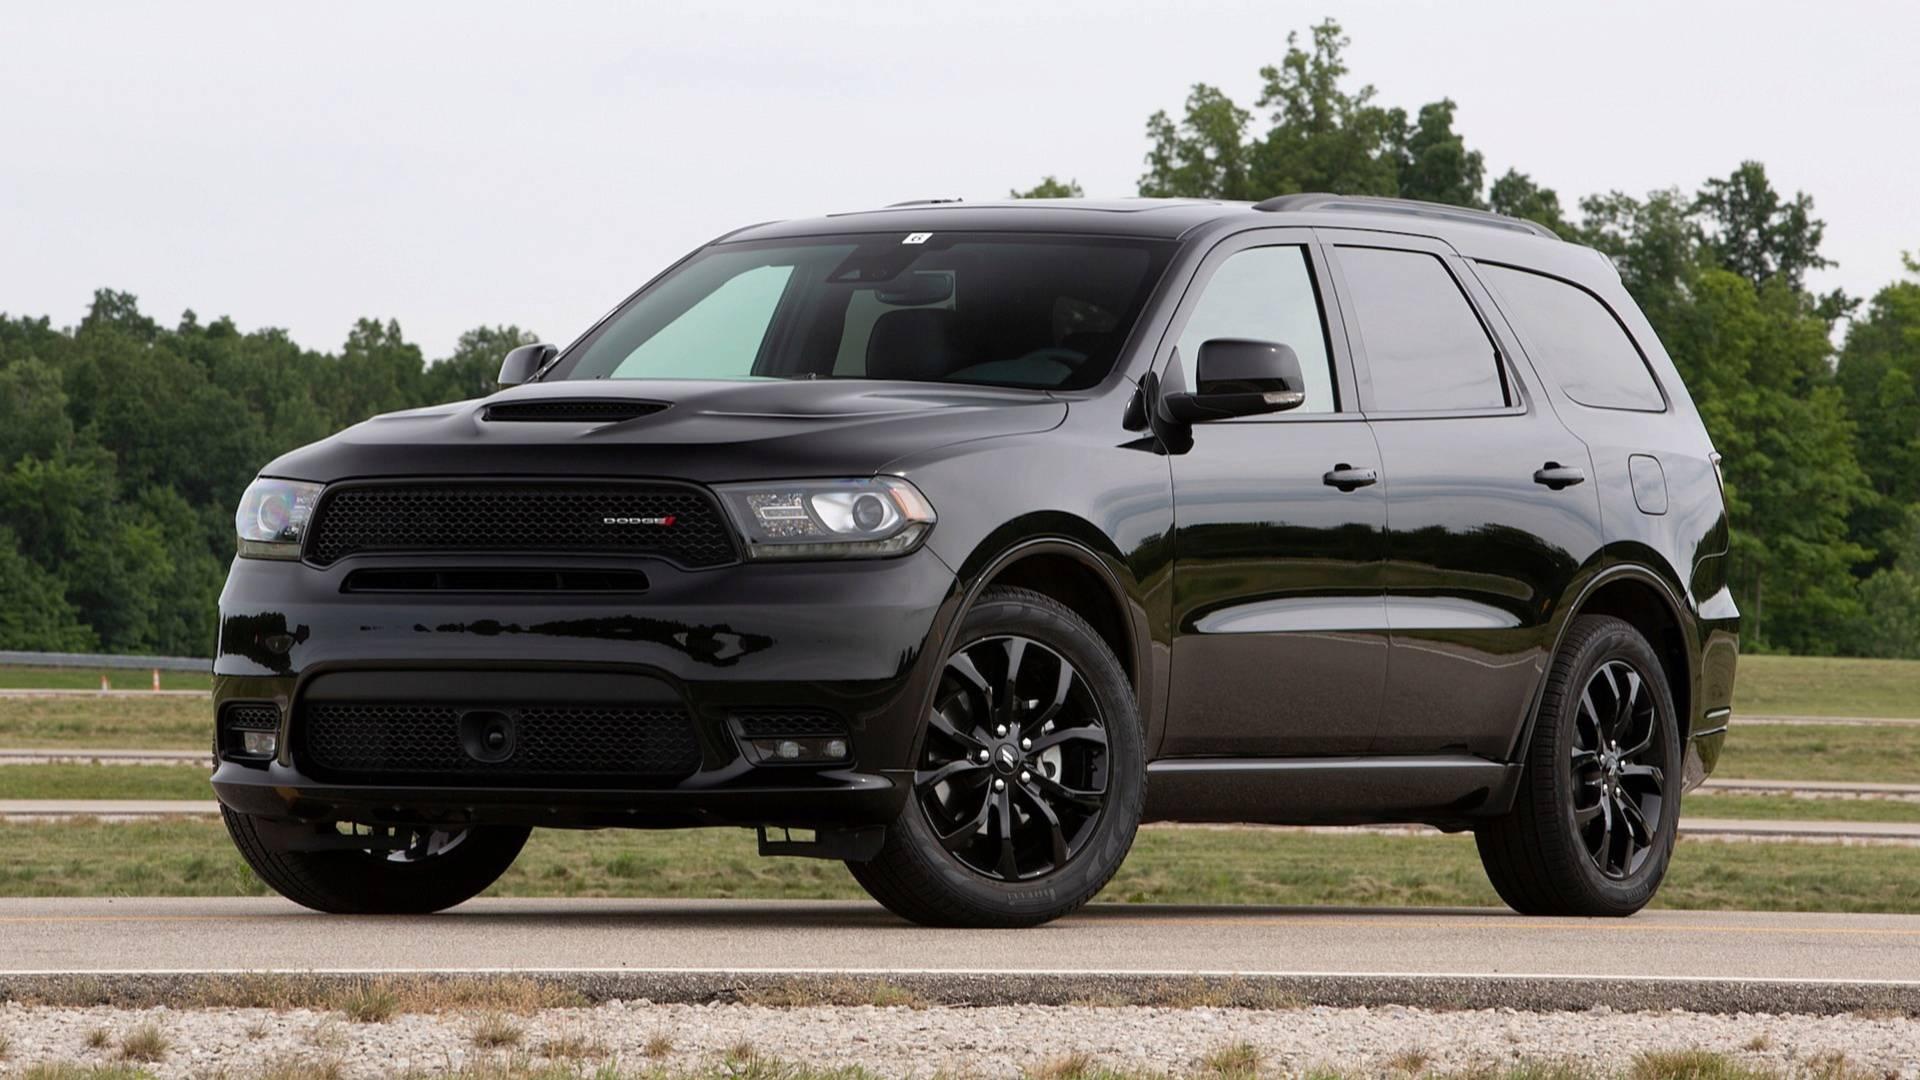 2019 Dodge Durango Gt Gets An Srt Inspired Face And Hood